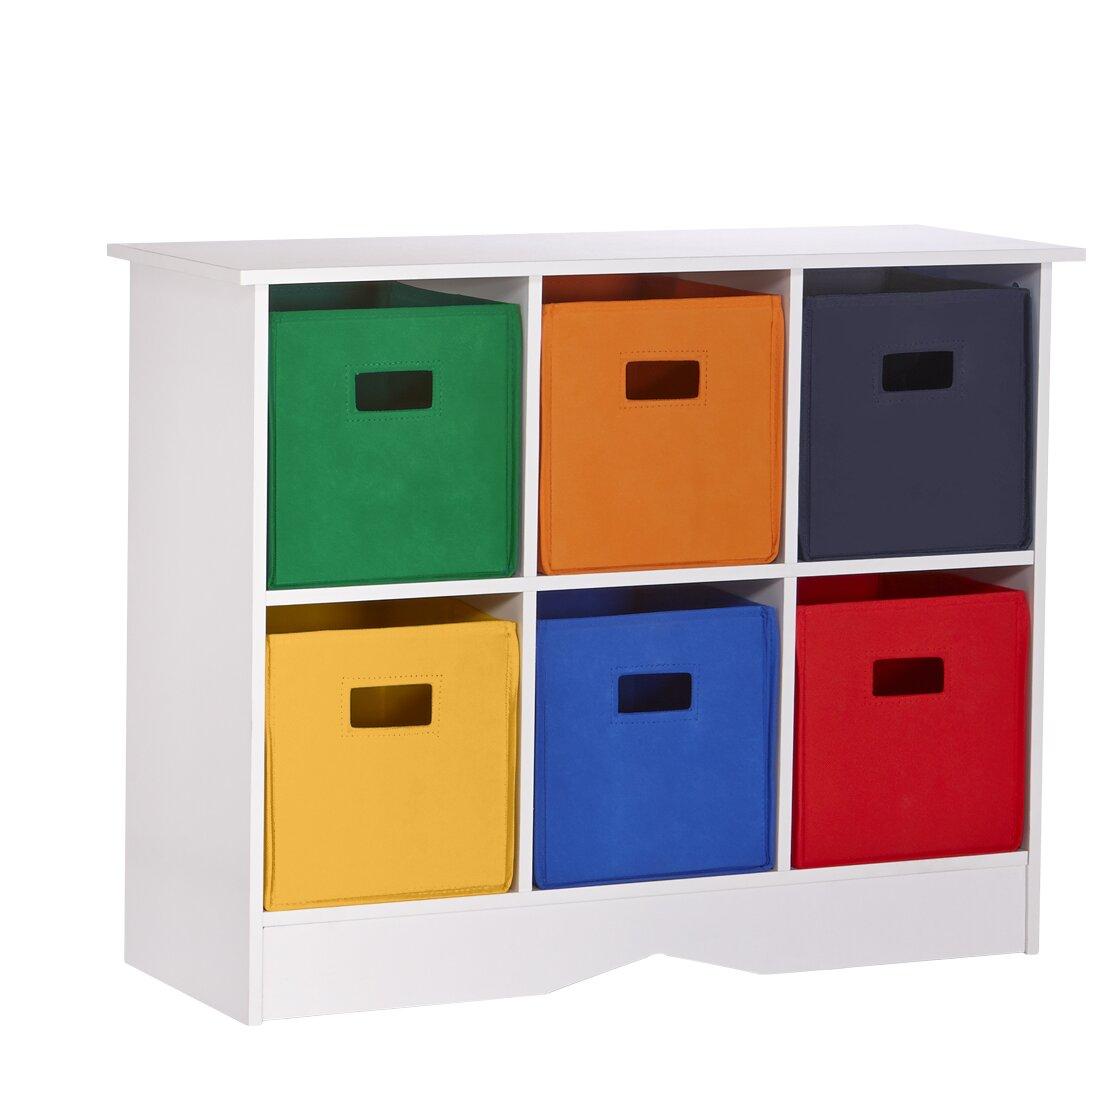 Riverridge Kids Riverridge Kids 6 Compartment Storage